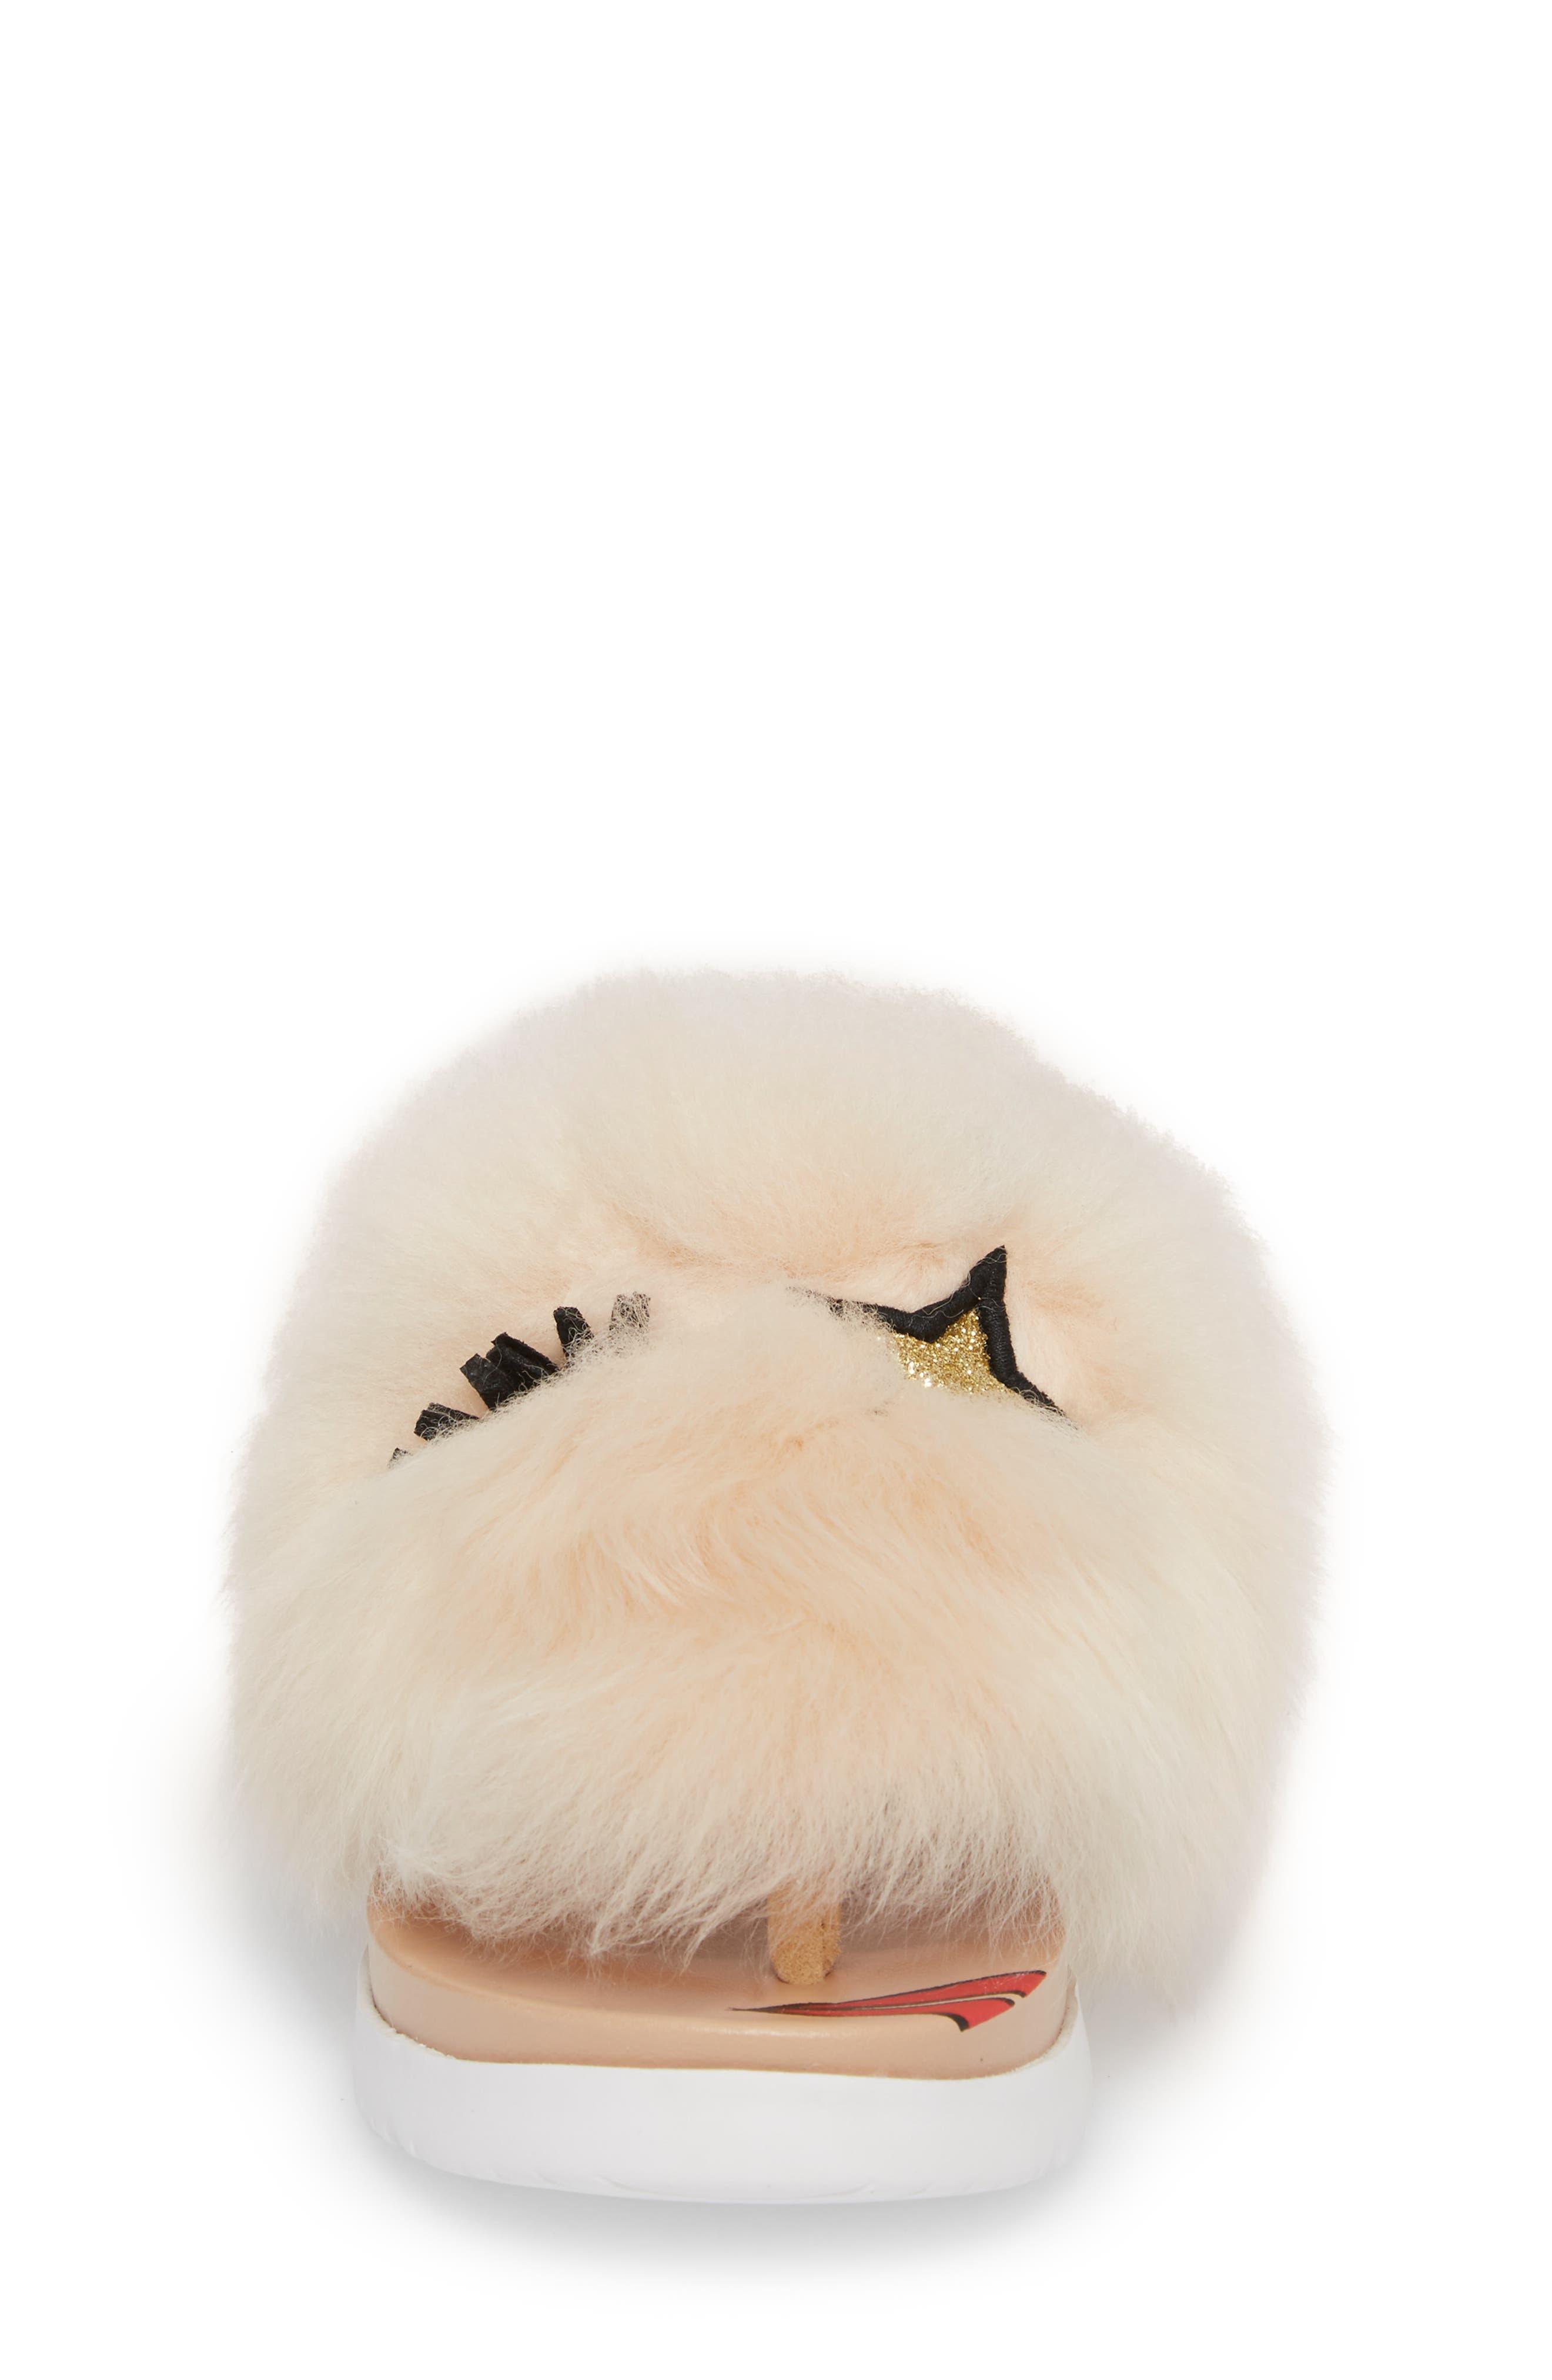 Punki Genuine Shearling Sandal,                             Alternate thumbnail 4, color,                             Natural/ Soft Ochre